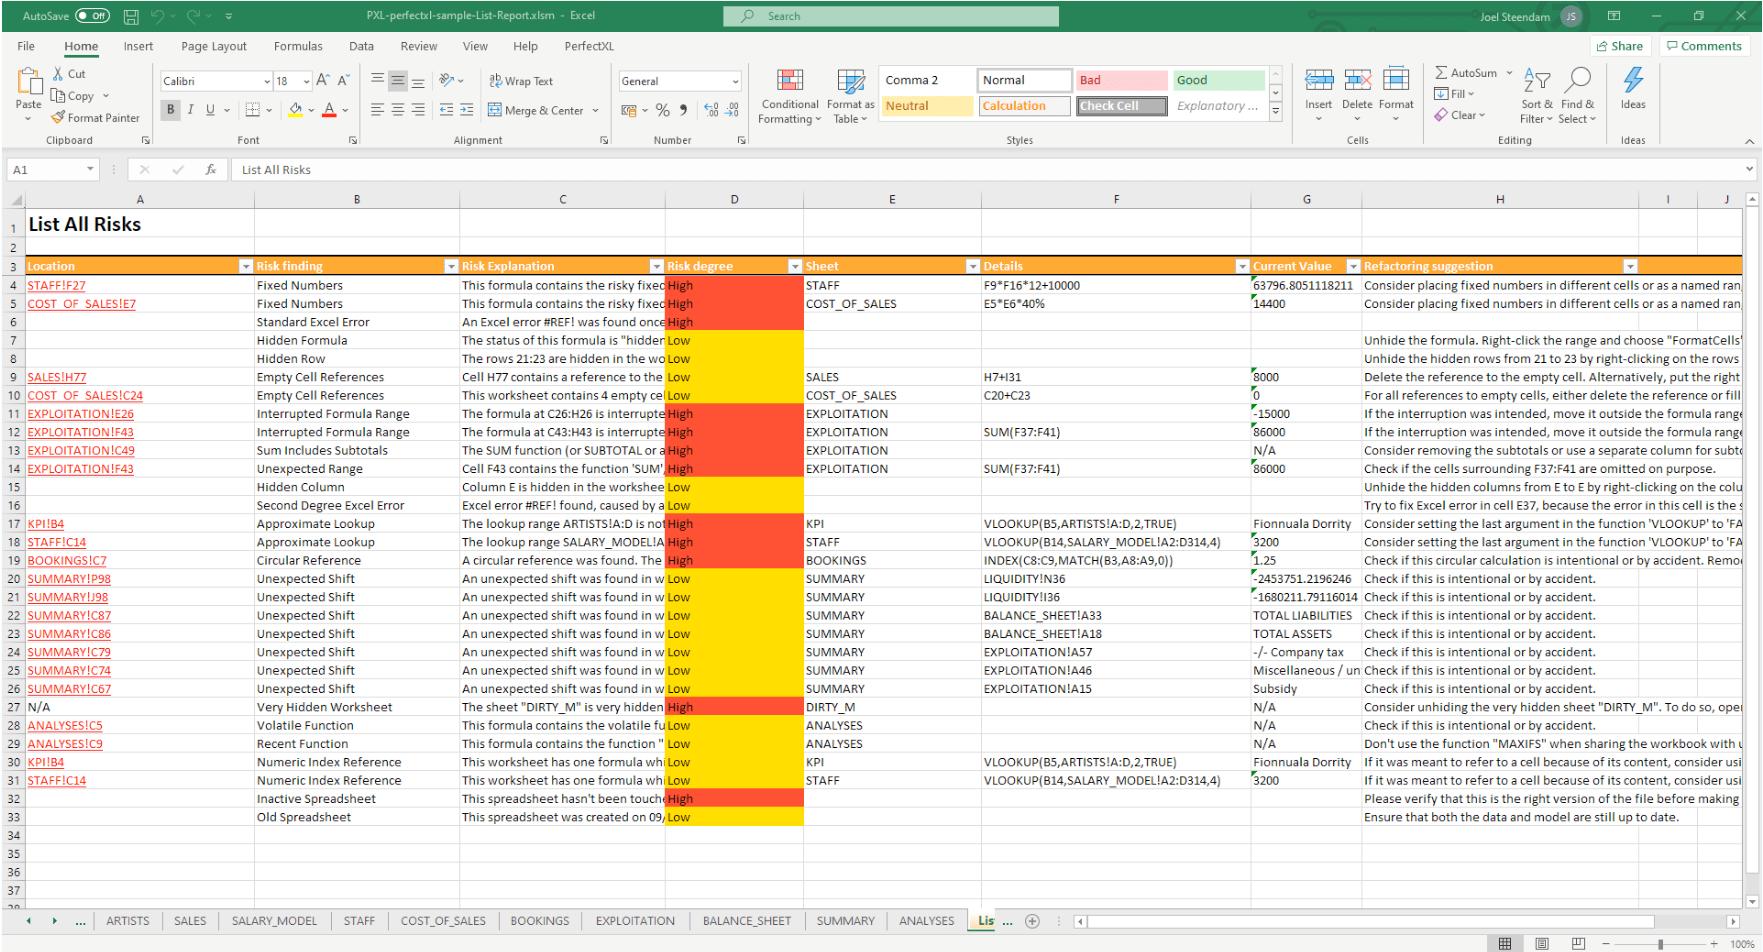 Reports in Excel // PerfectXL Risk Eliminator